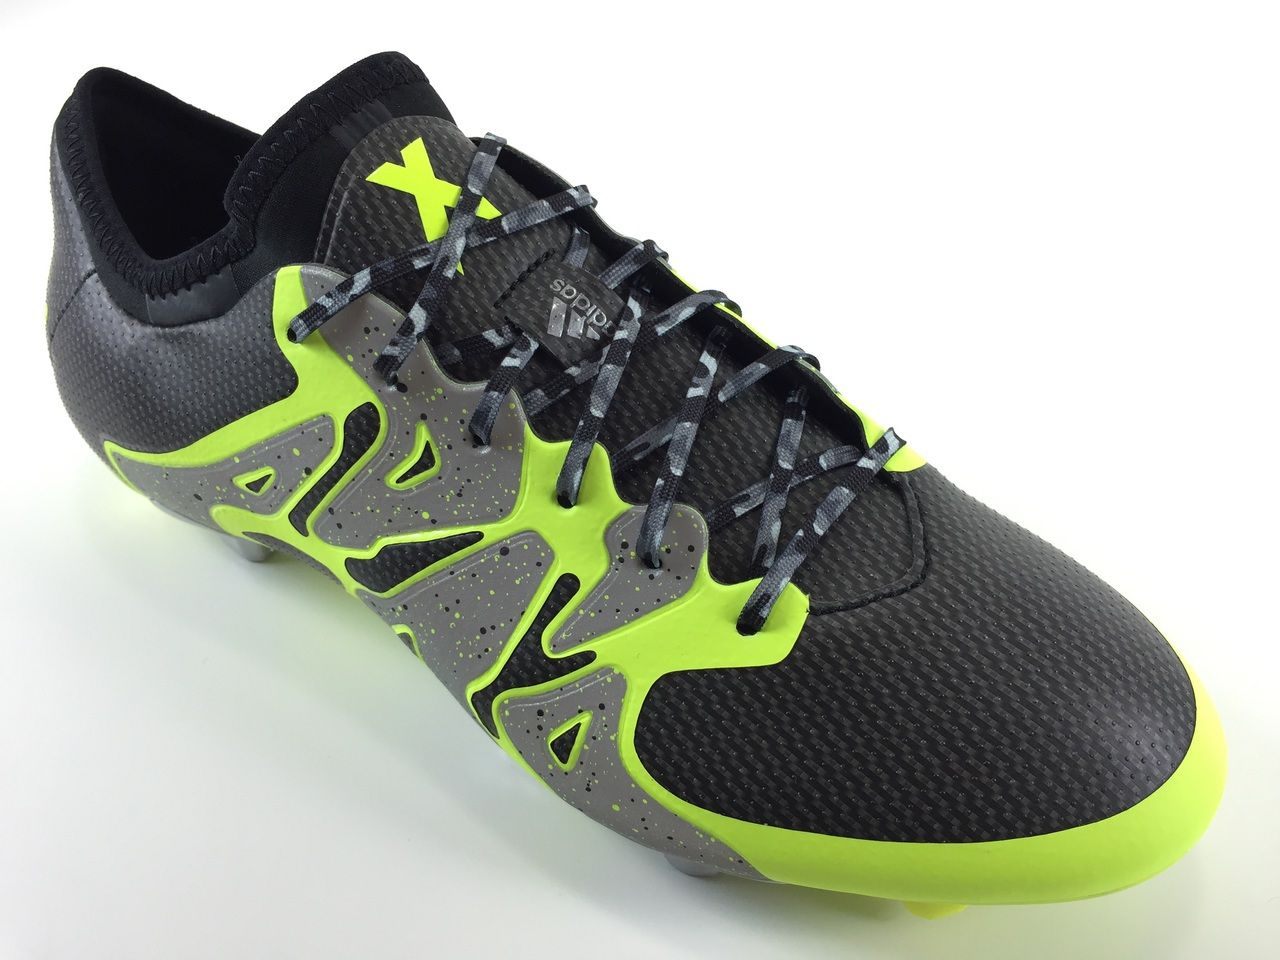 Http Mlcaspp Id917998 300 Nike Https I Sepatu Futsal Hypervenom Phelon Ii Ic 749898 888 Orange 6028bc1af5b8180a71ee0a9d44414ea6